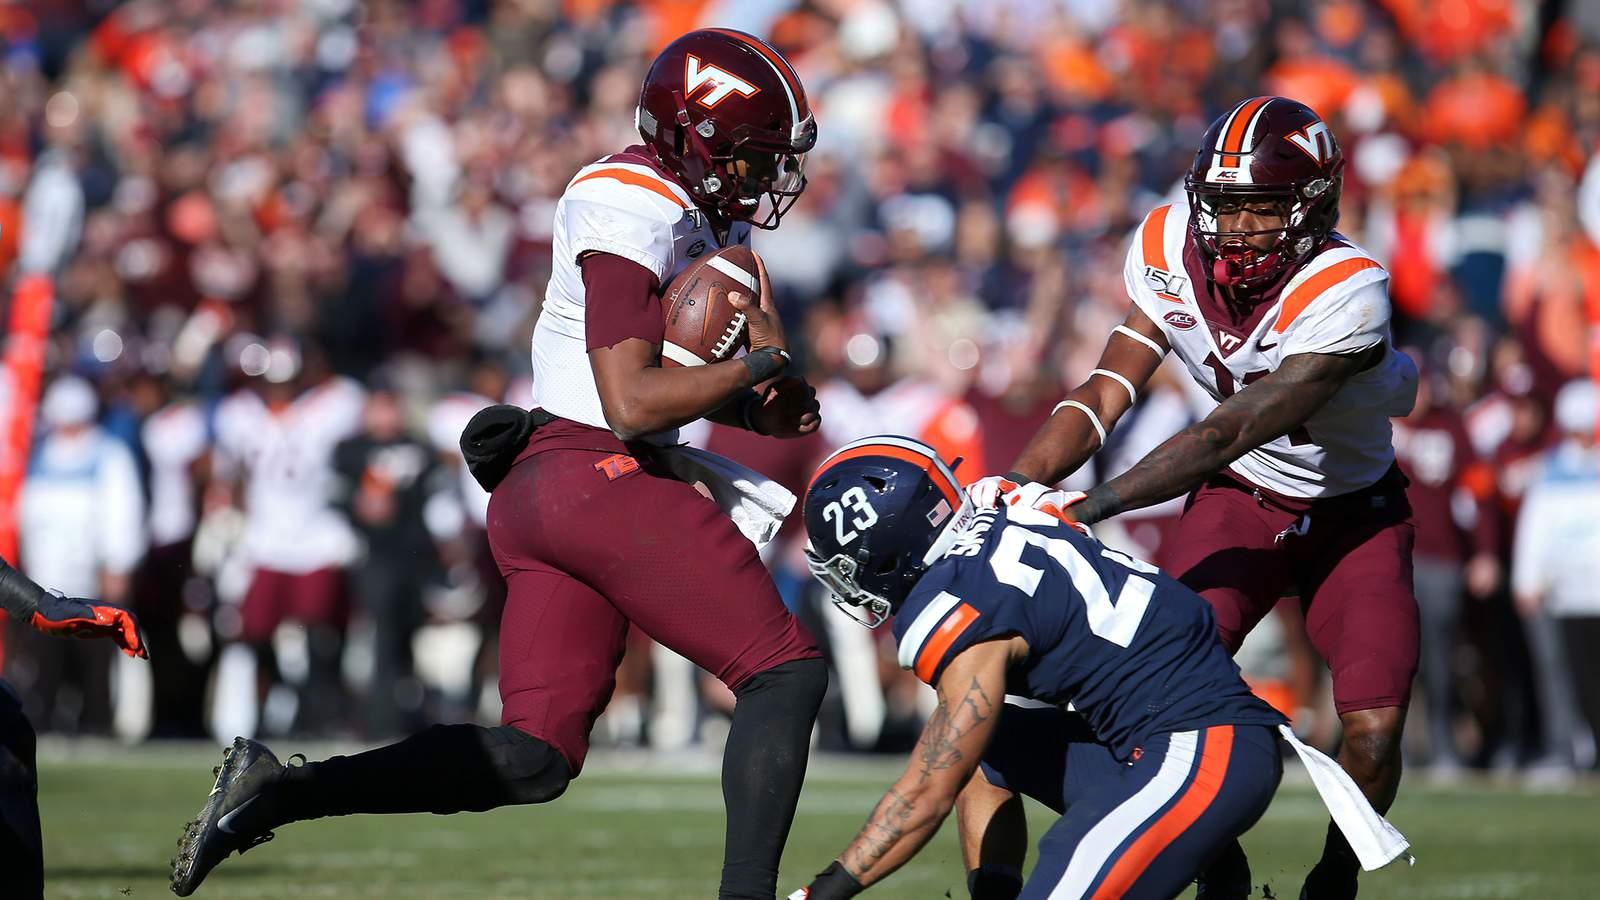 Virginia Tech Halloween 2020 Commonwealth Cup to kickoff Virginia Tech's 2020 football season